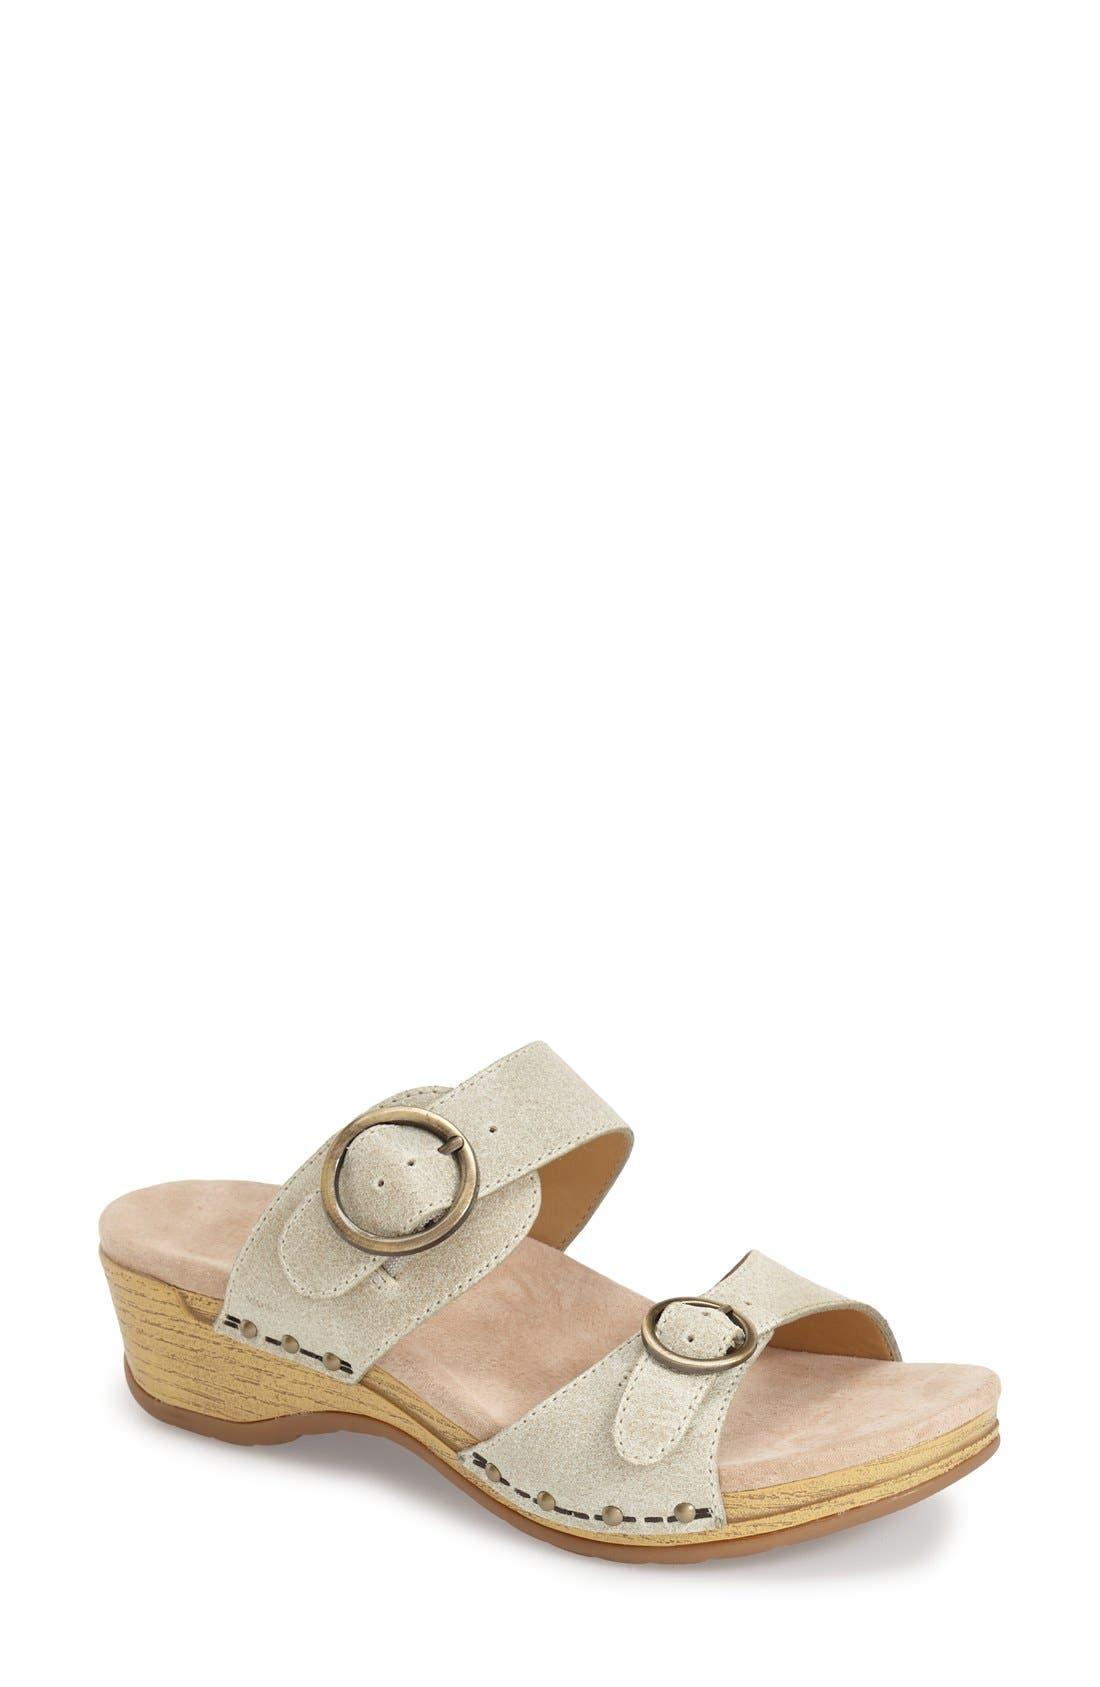 Main Image - Dansko 'Manda' Slide Sandal (Women)